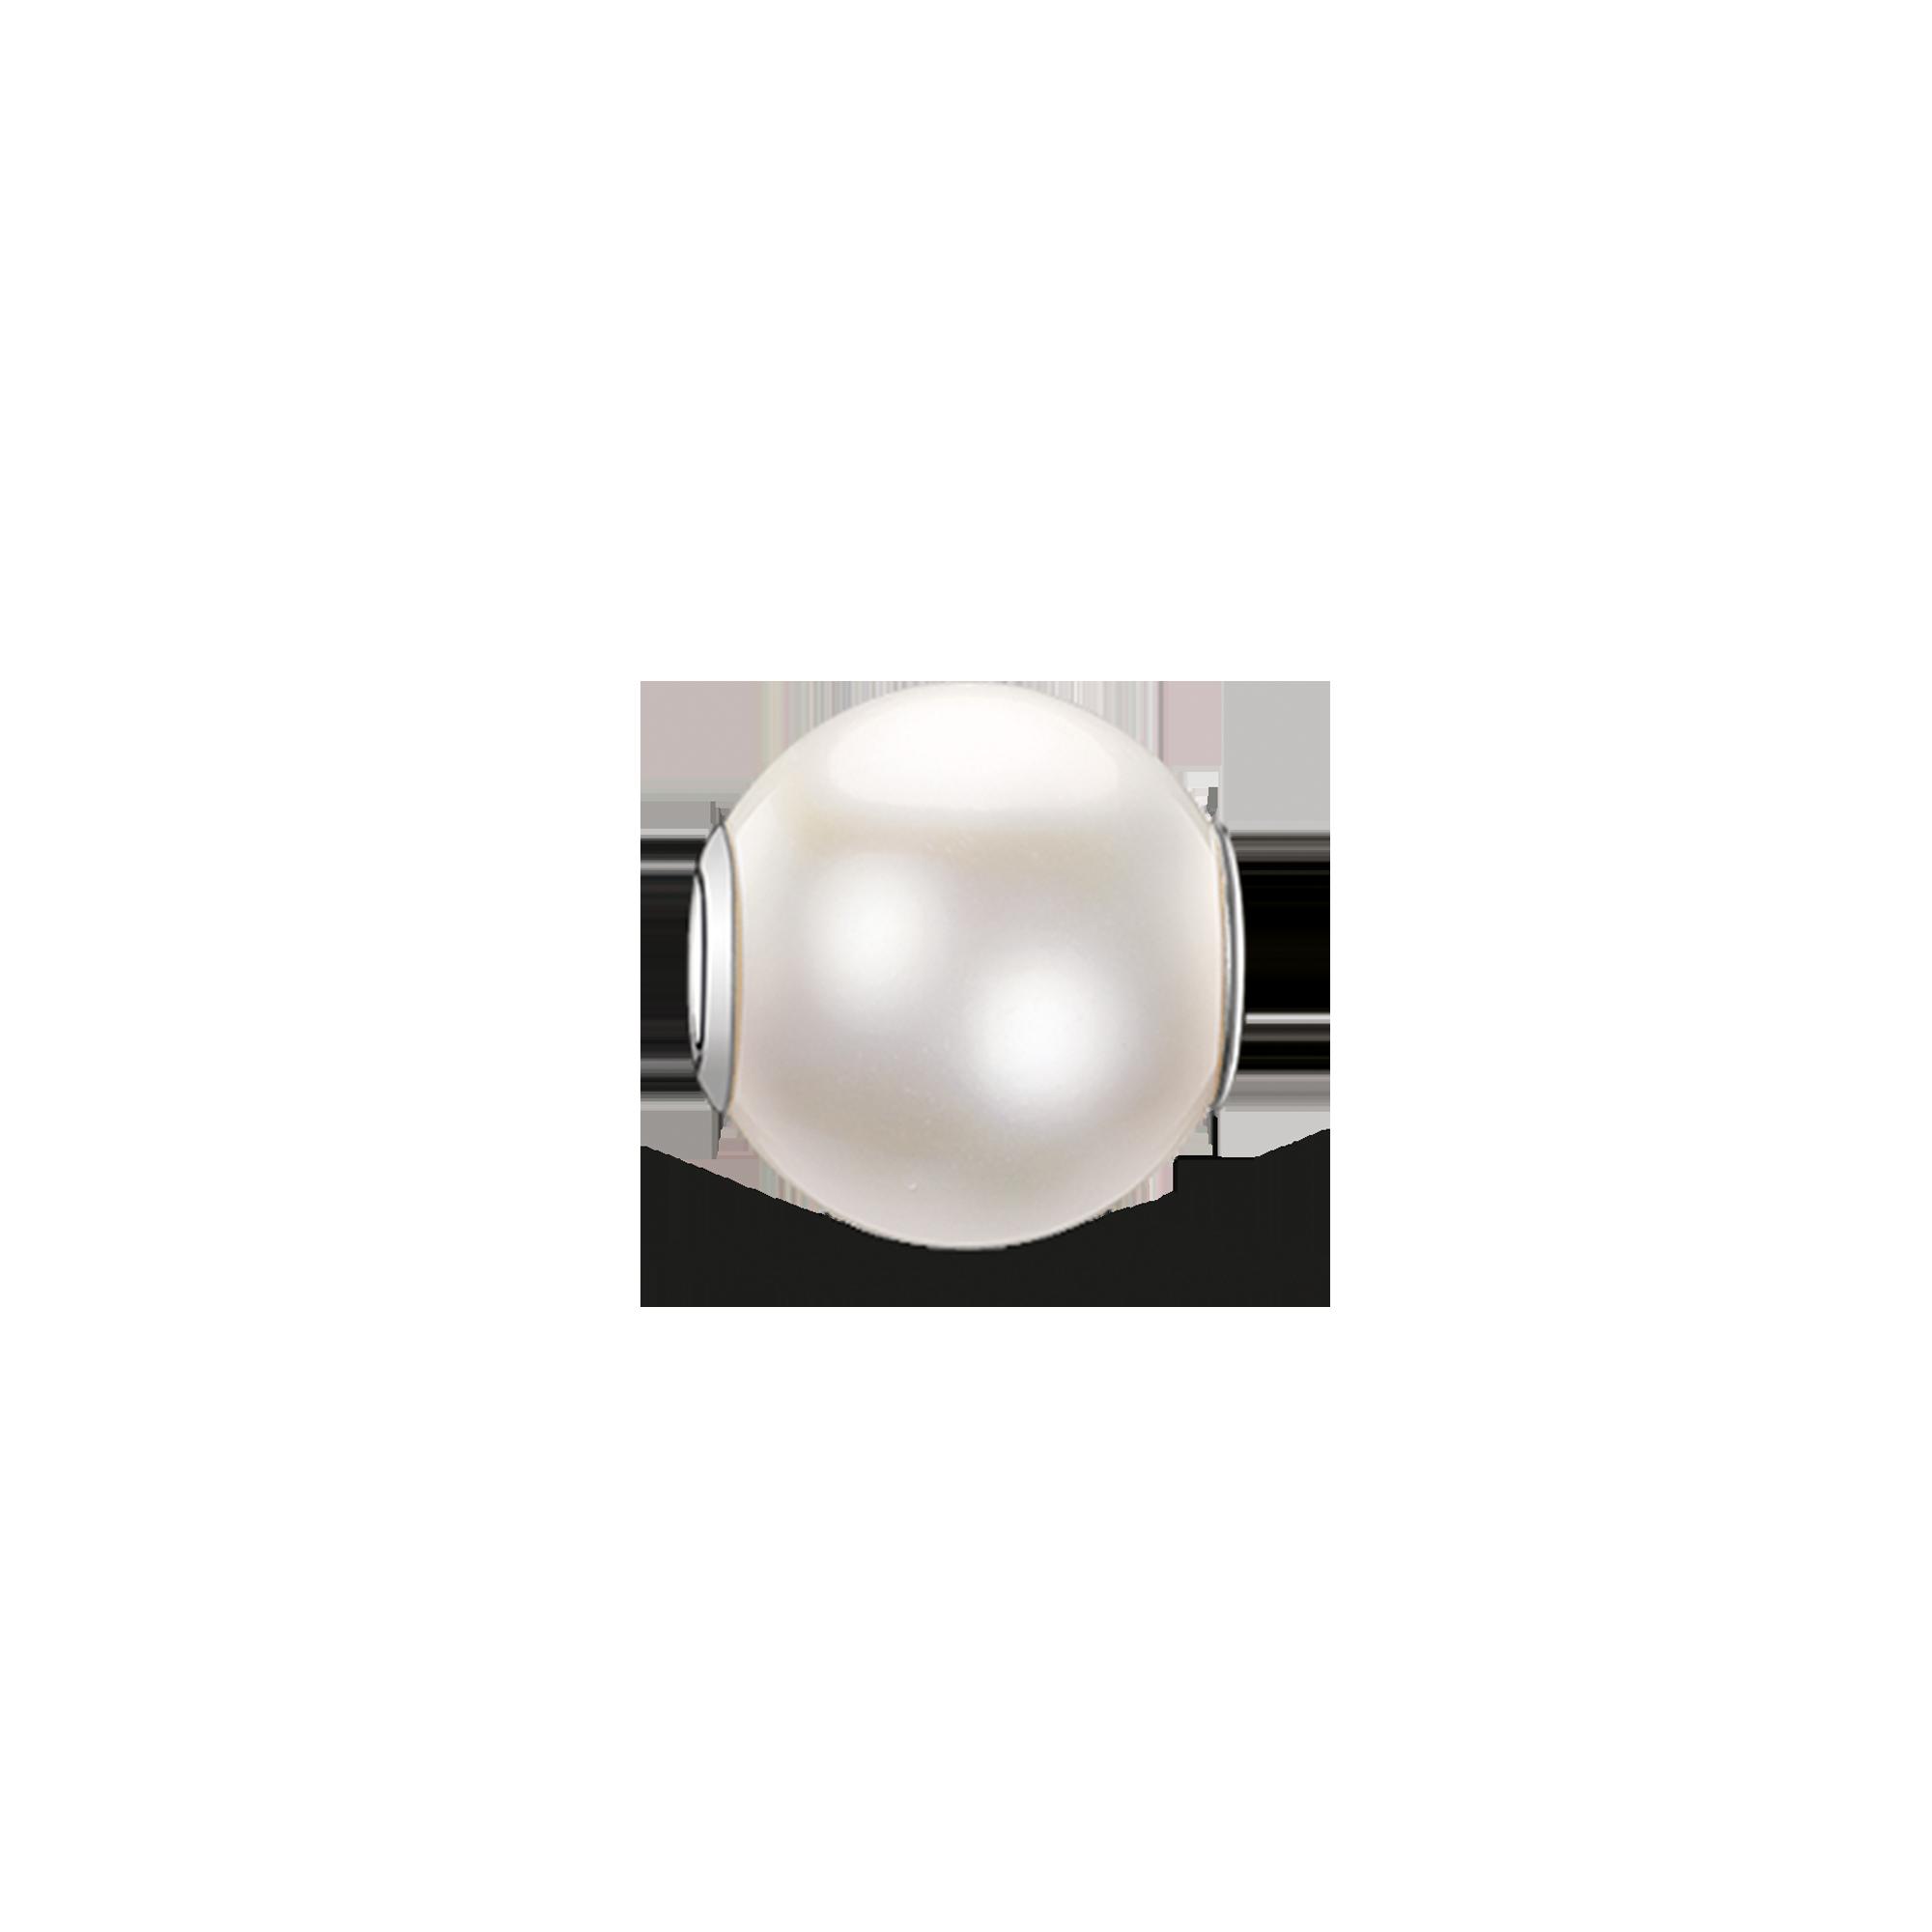 "Thomas Sabo - Bead "" pearl large"" white - 1"